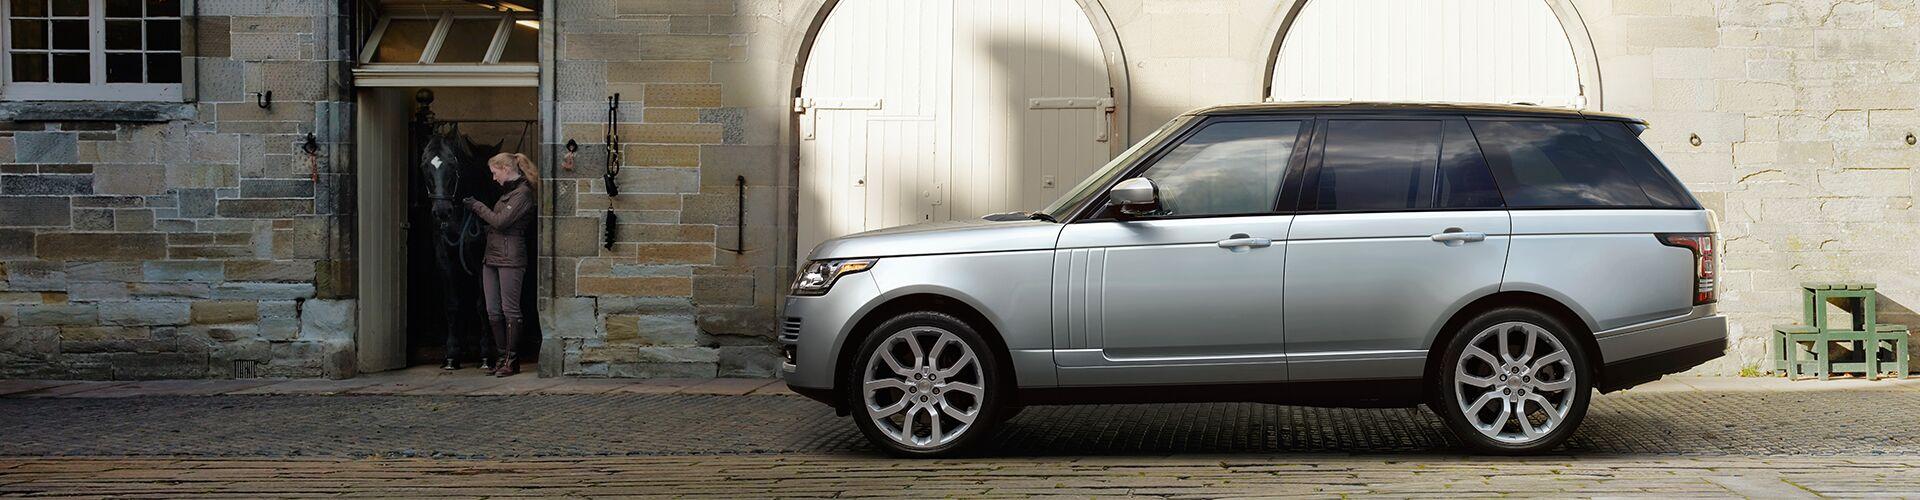 Land Rover Dealership Ventura CA Used Cars Land Rover Ventura - Range rover repair los angeles